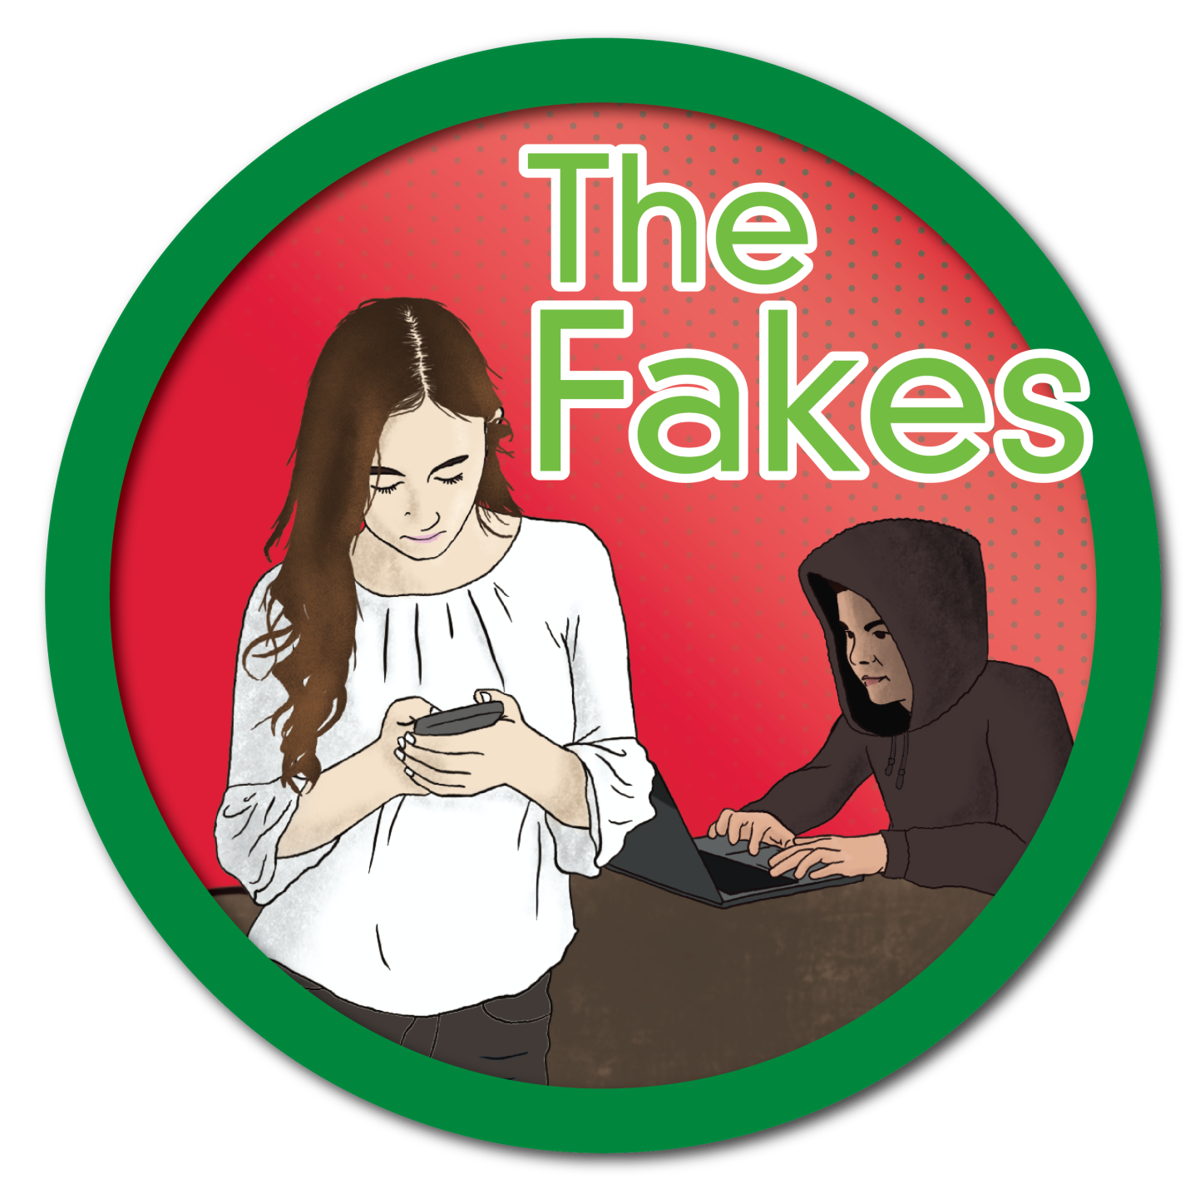 fakes.png